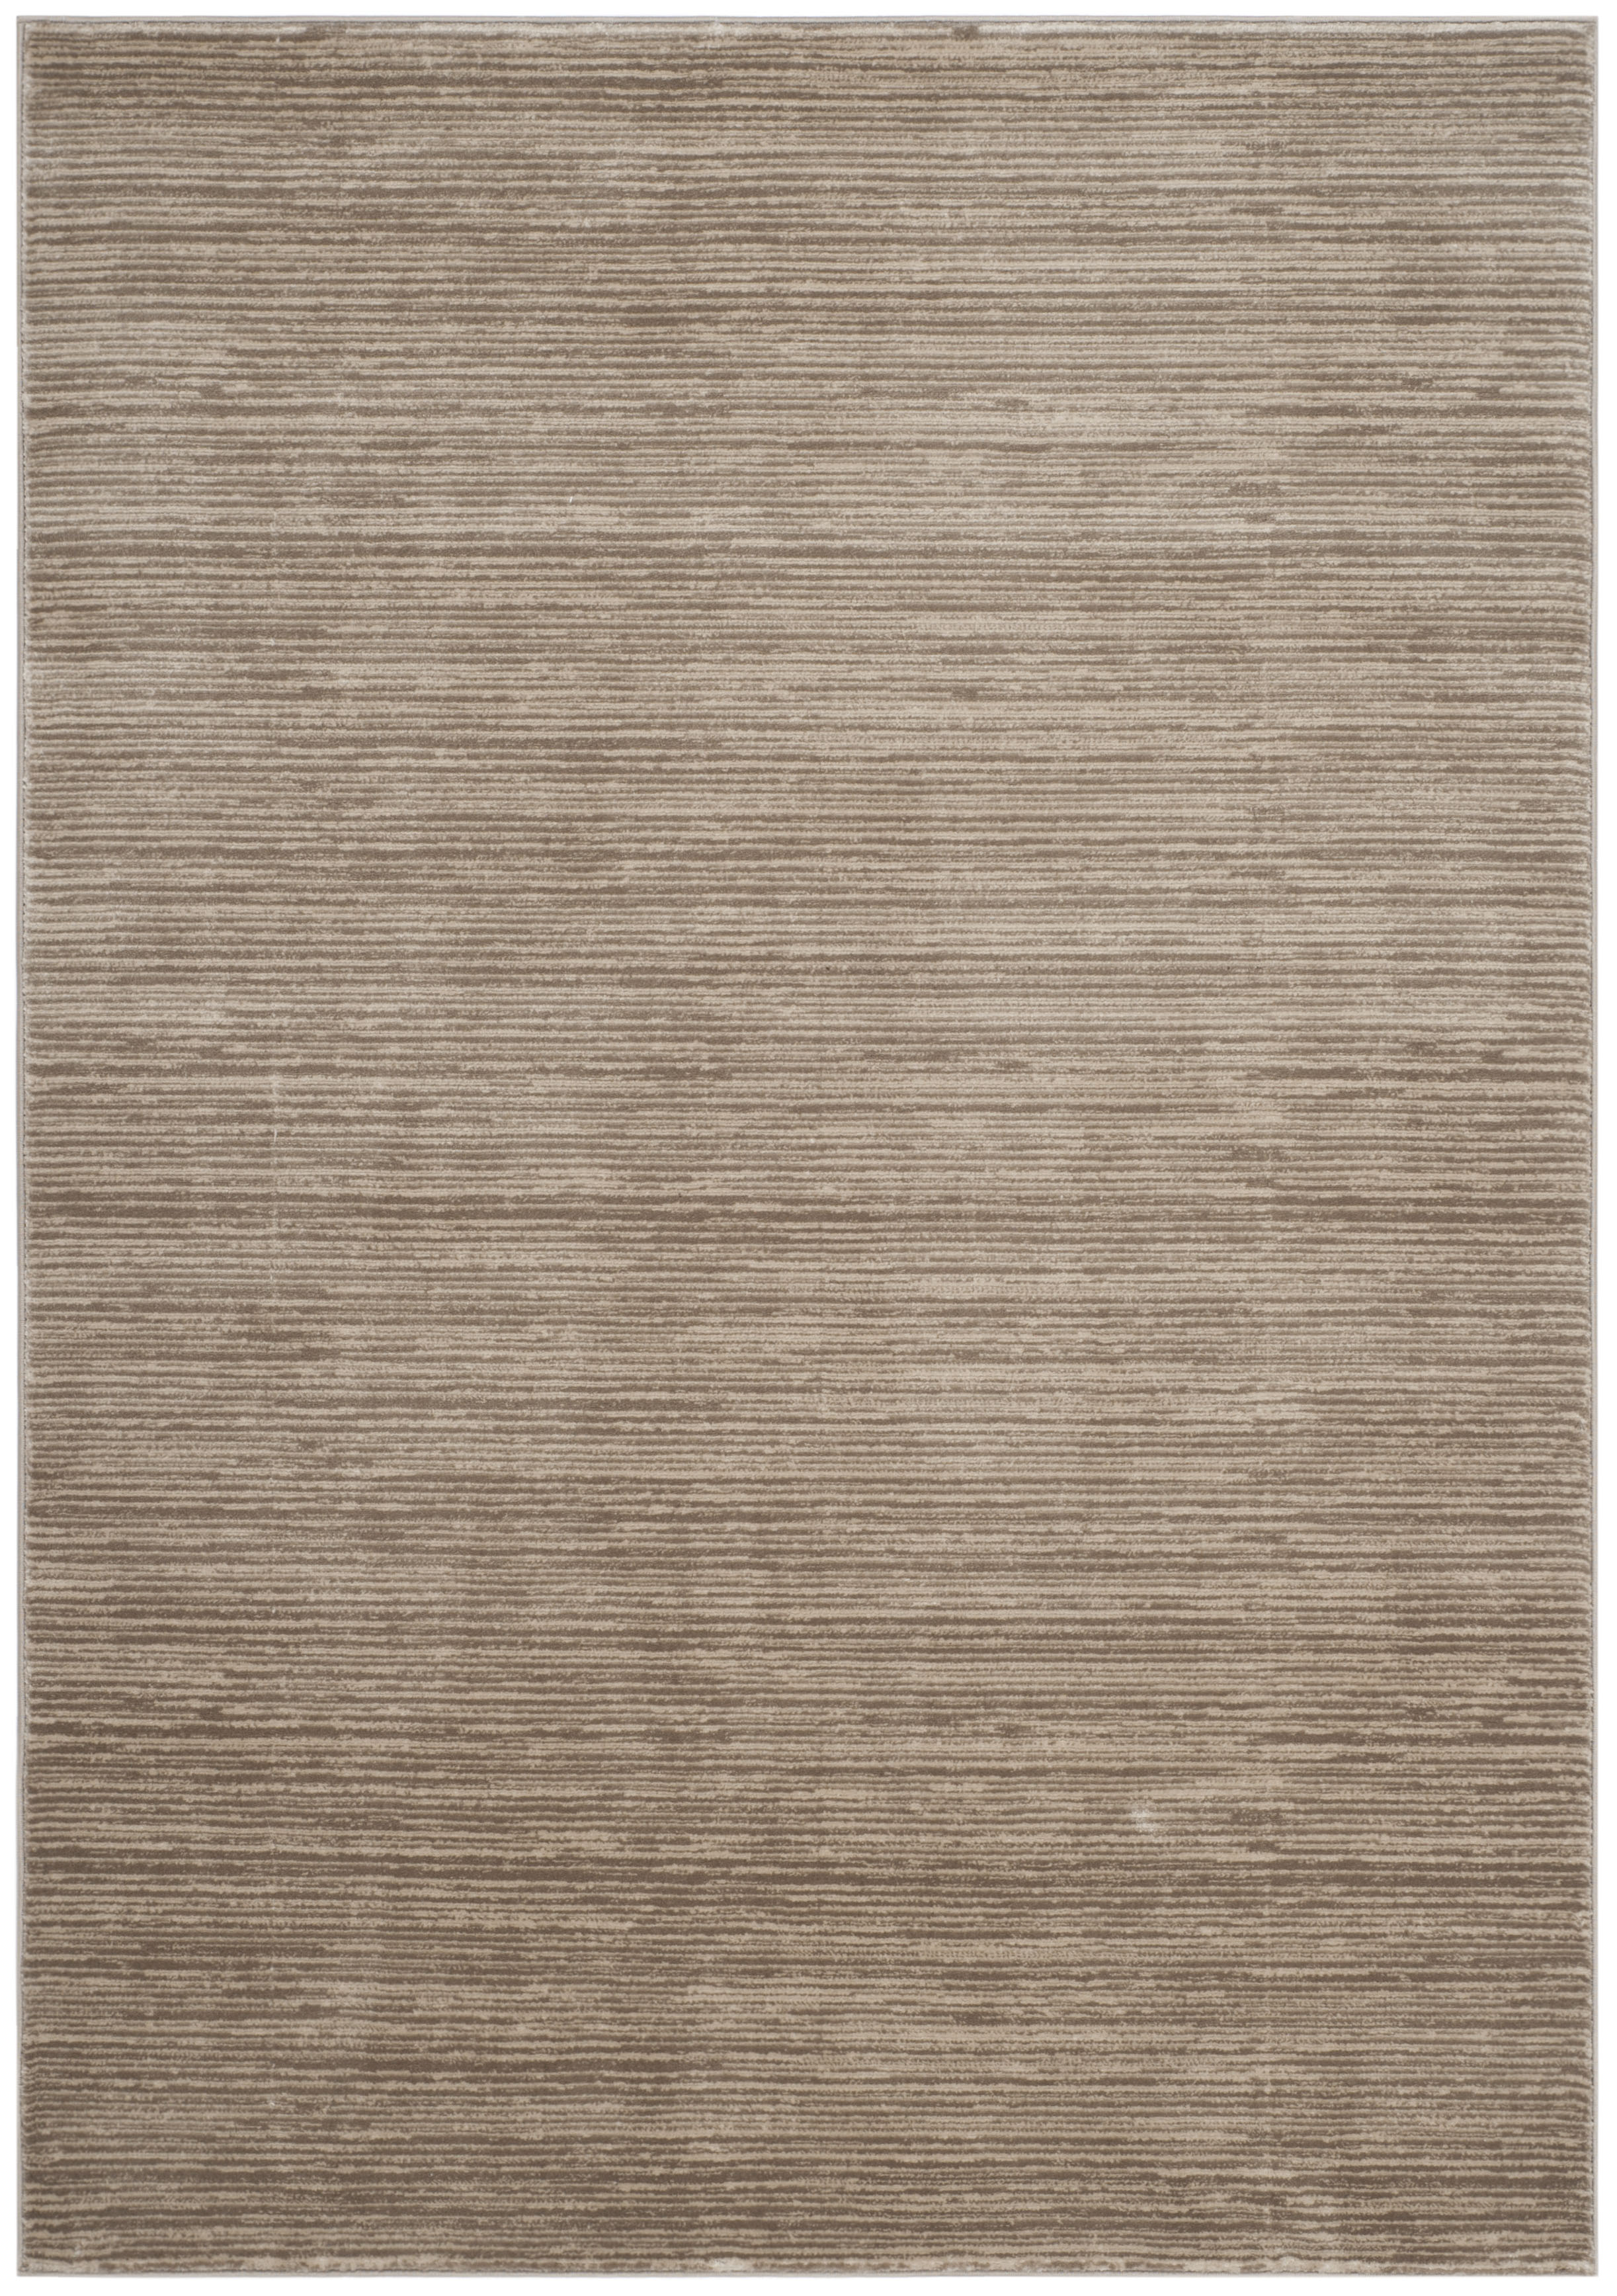 Tapis de salon contemporain  marron clair 121x182